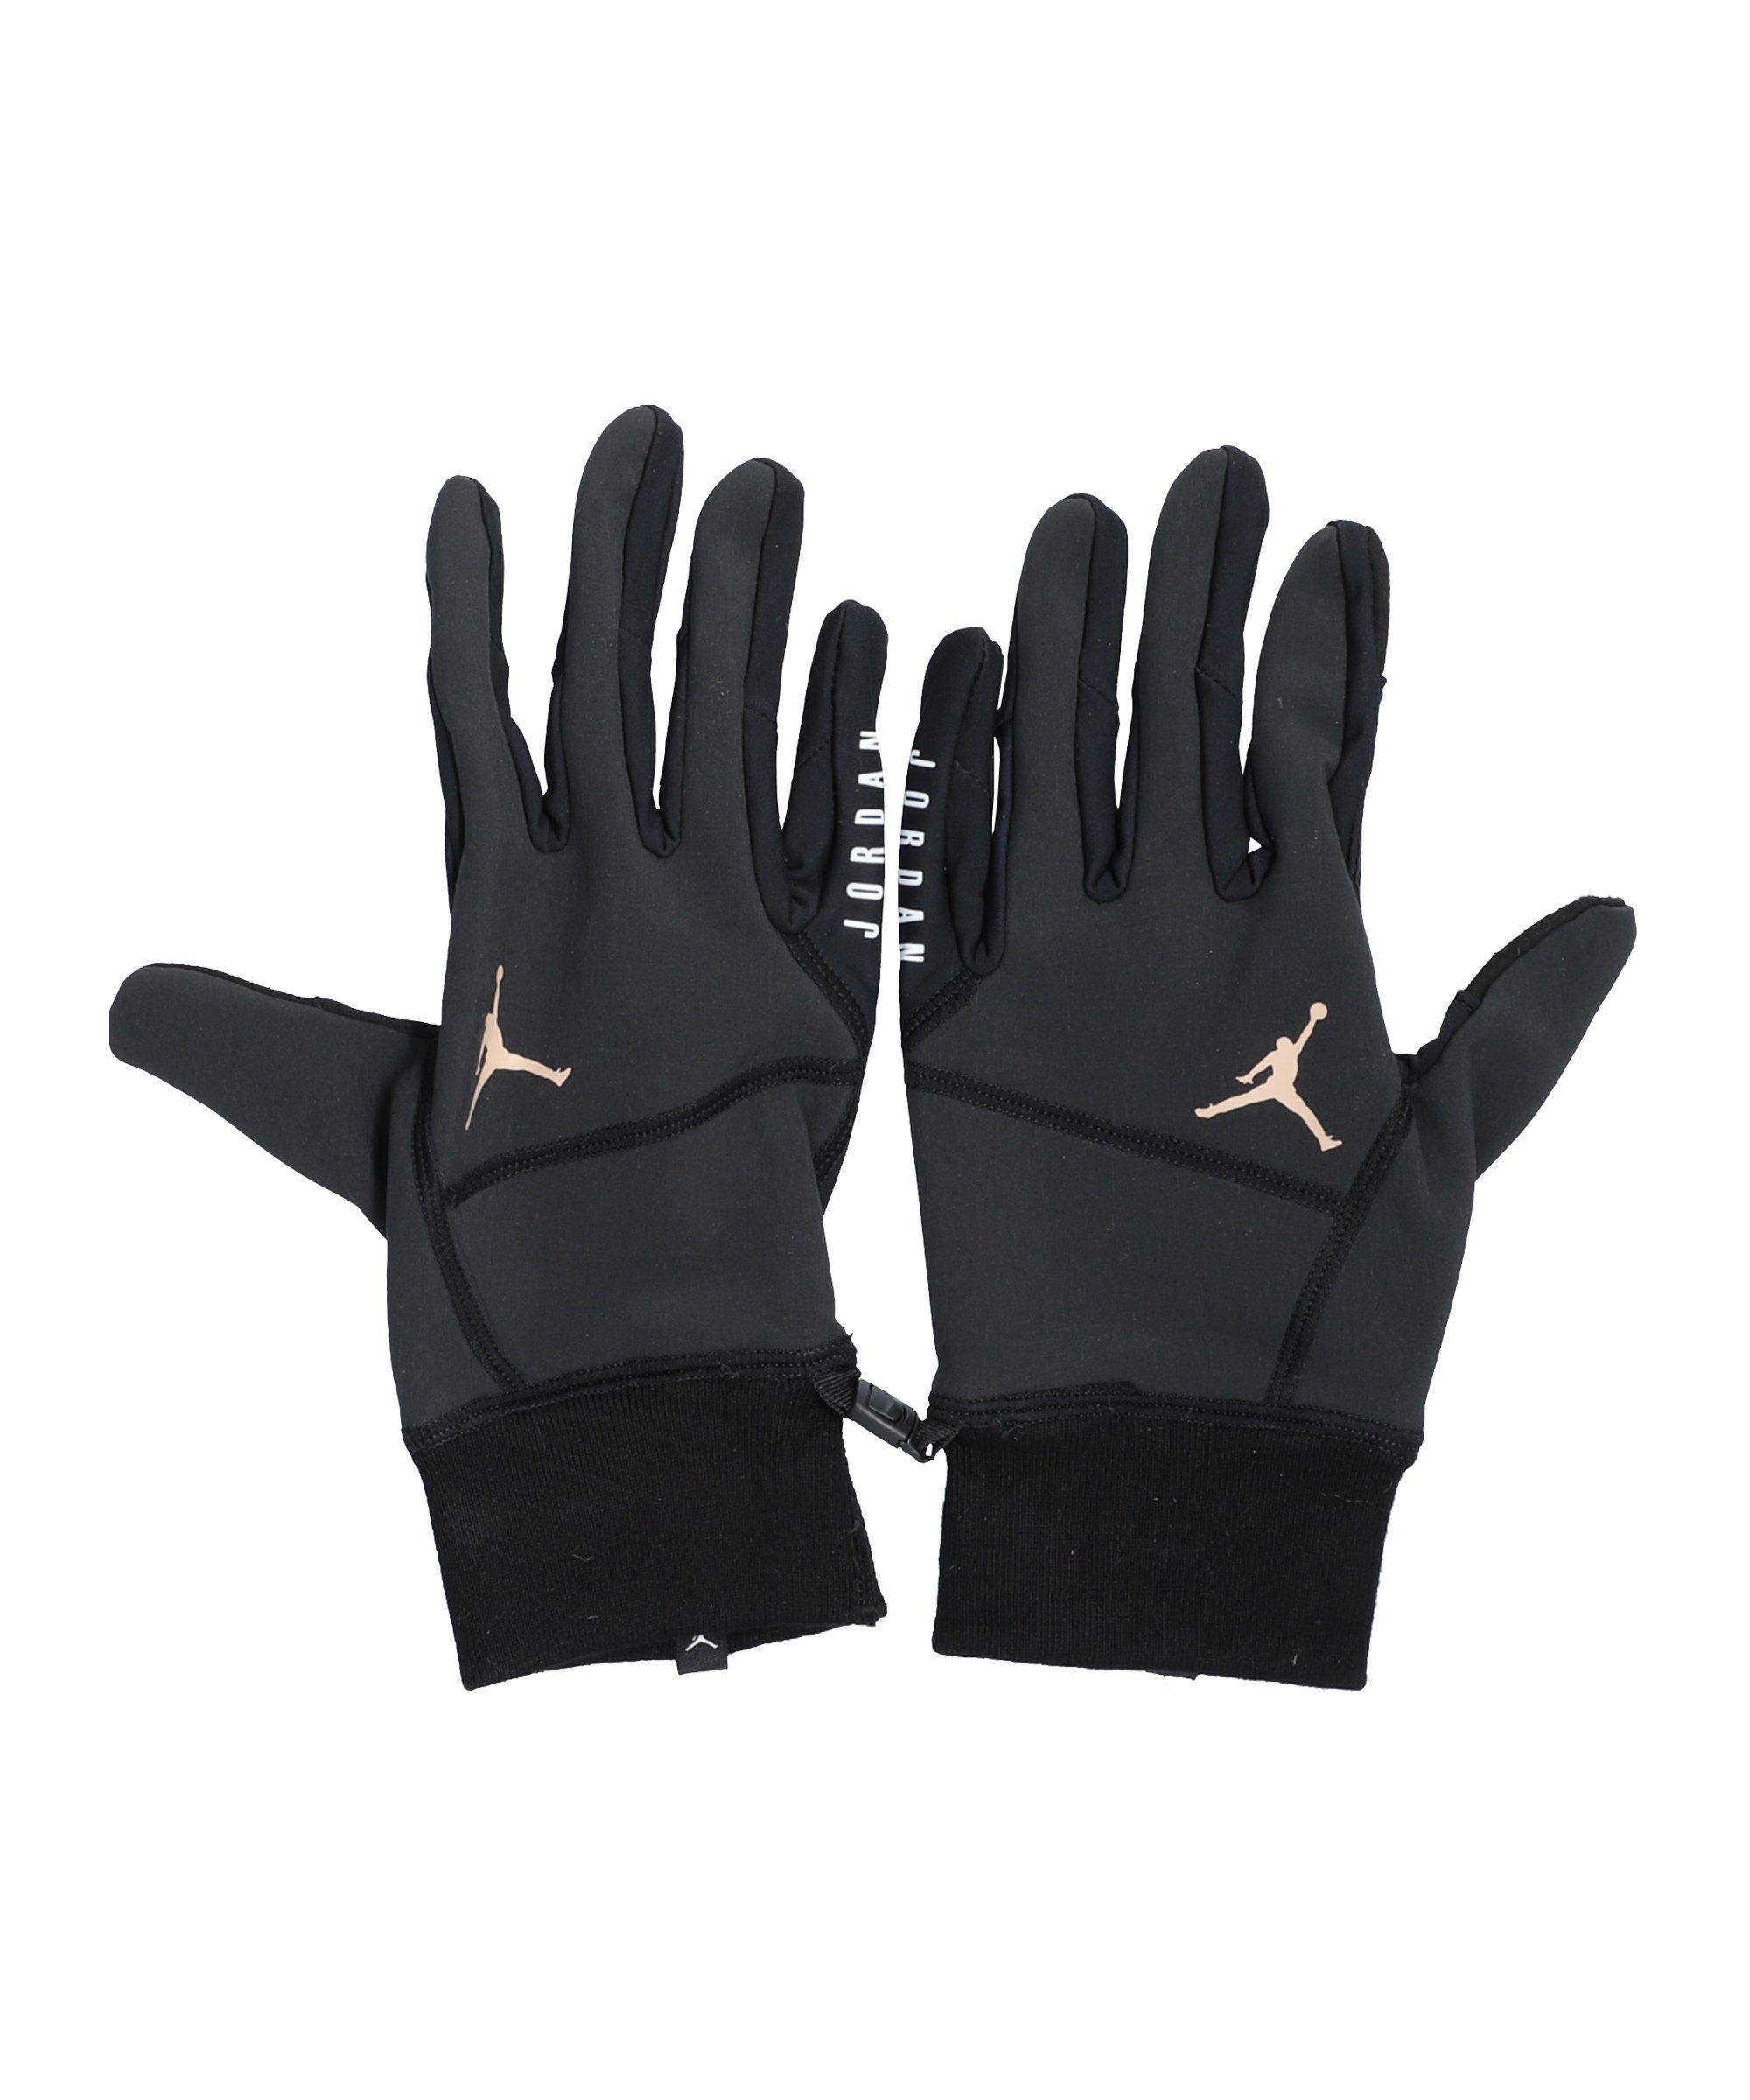 Jordan Hyperstorm Fleece Tech Handschuhe F034 - schwarz